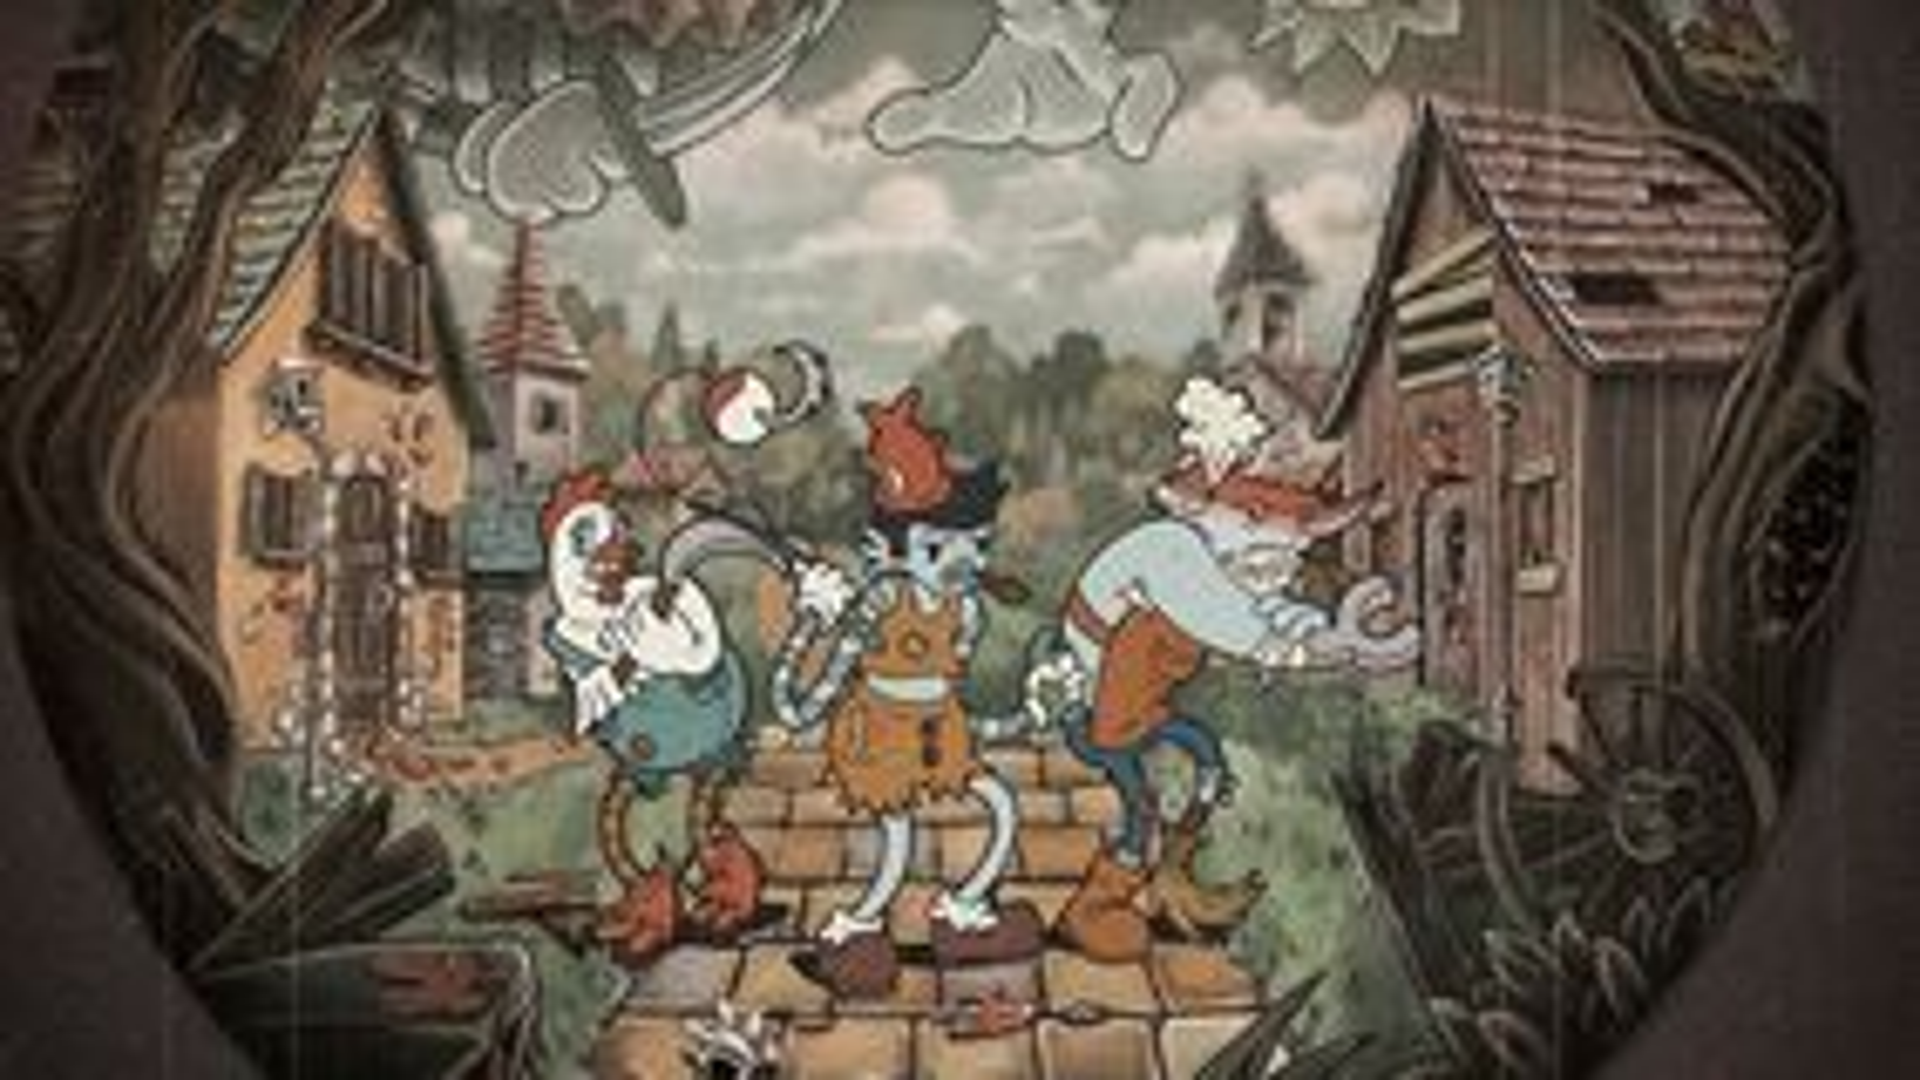 Townsfolk Tussle board game artwork